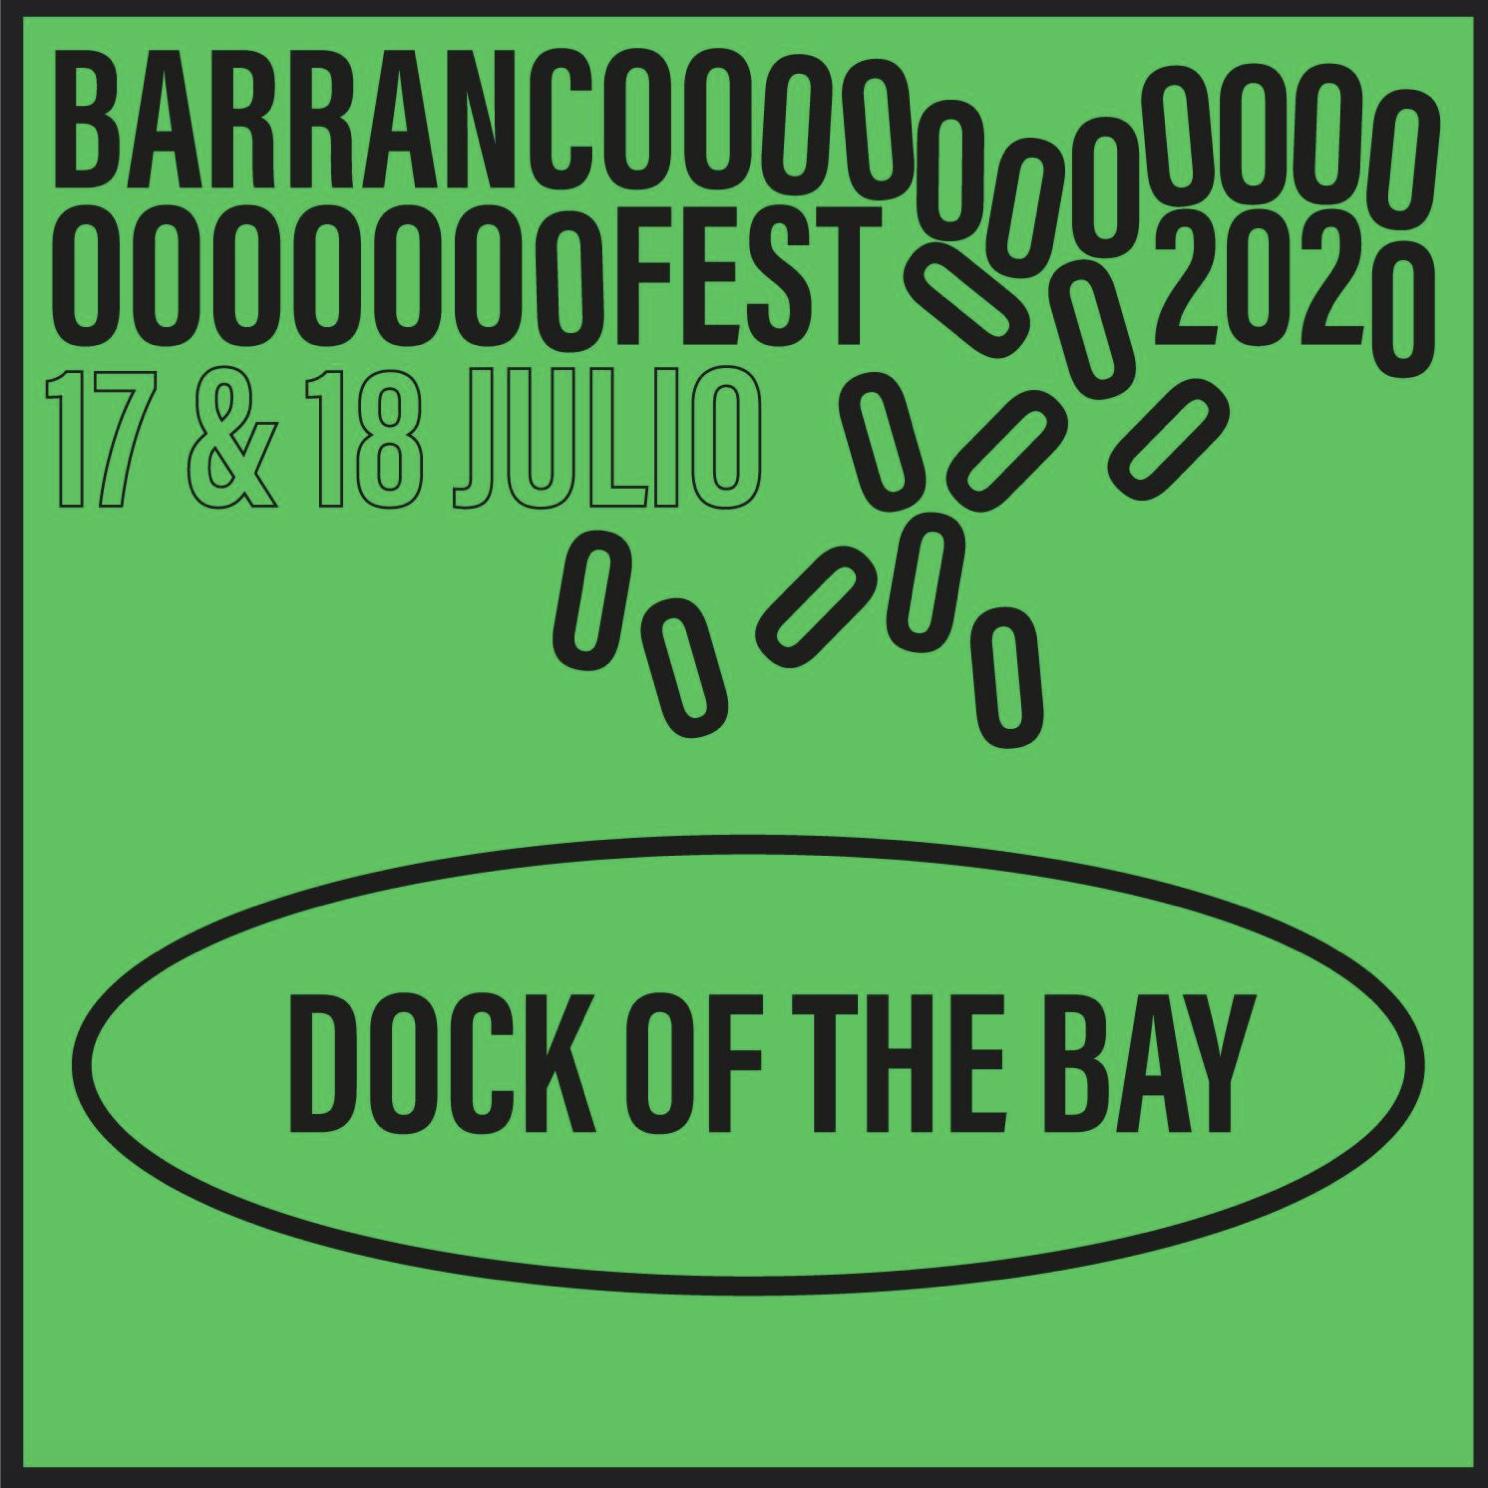 Barranco Fest 2022